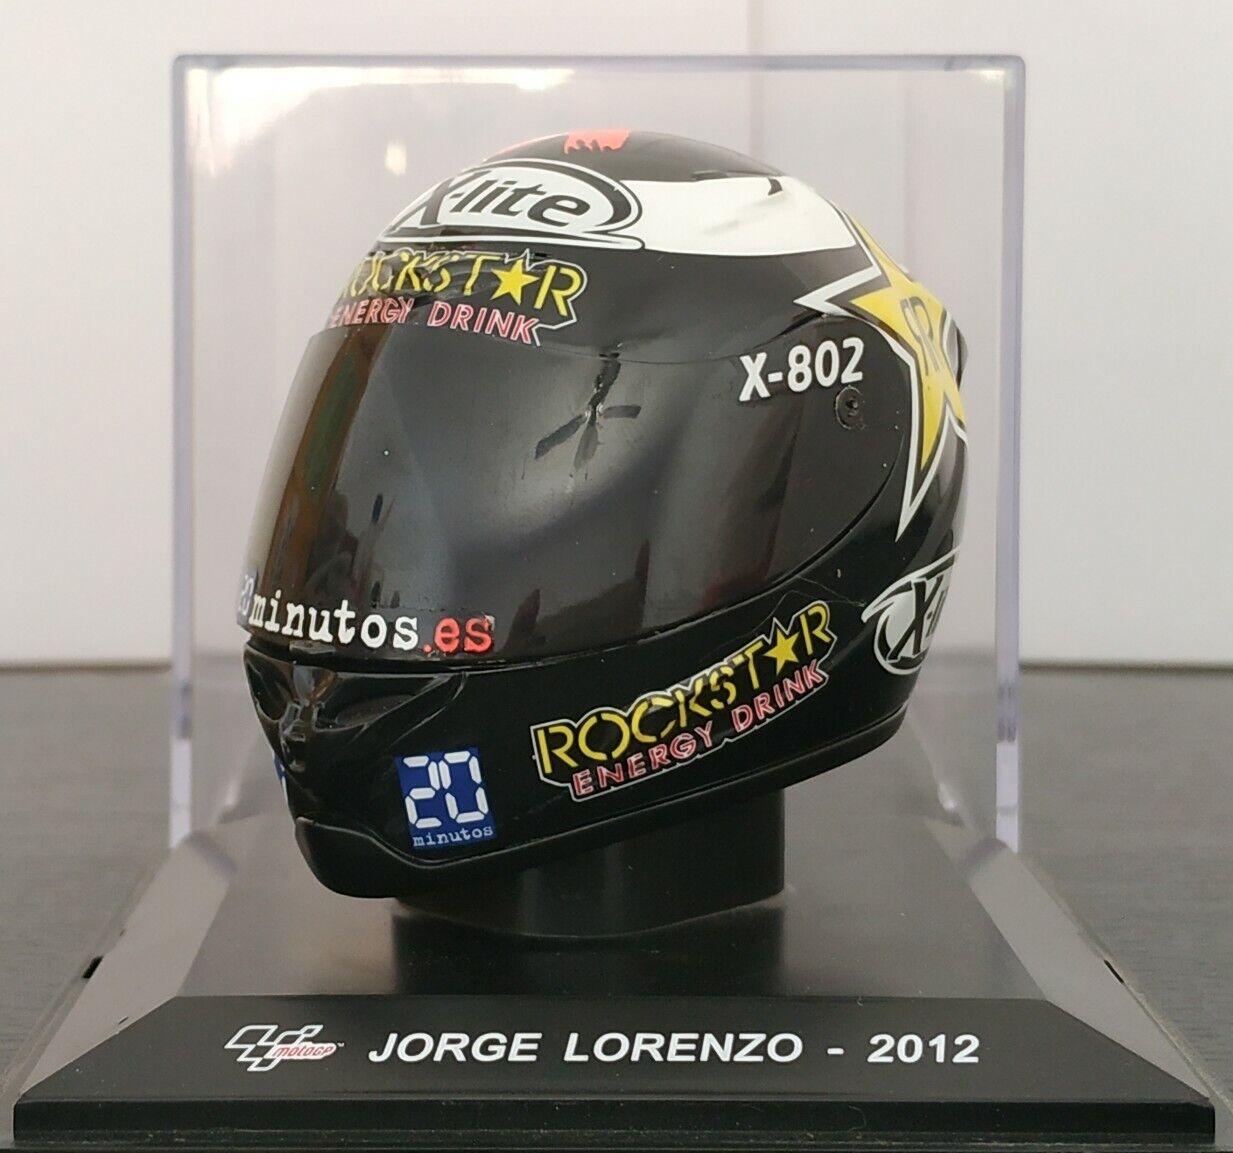 1 5 CASCO JORGE LORENZO 2012 HELMET COLECCION MOTO GP A ESCALA